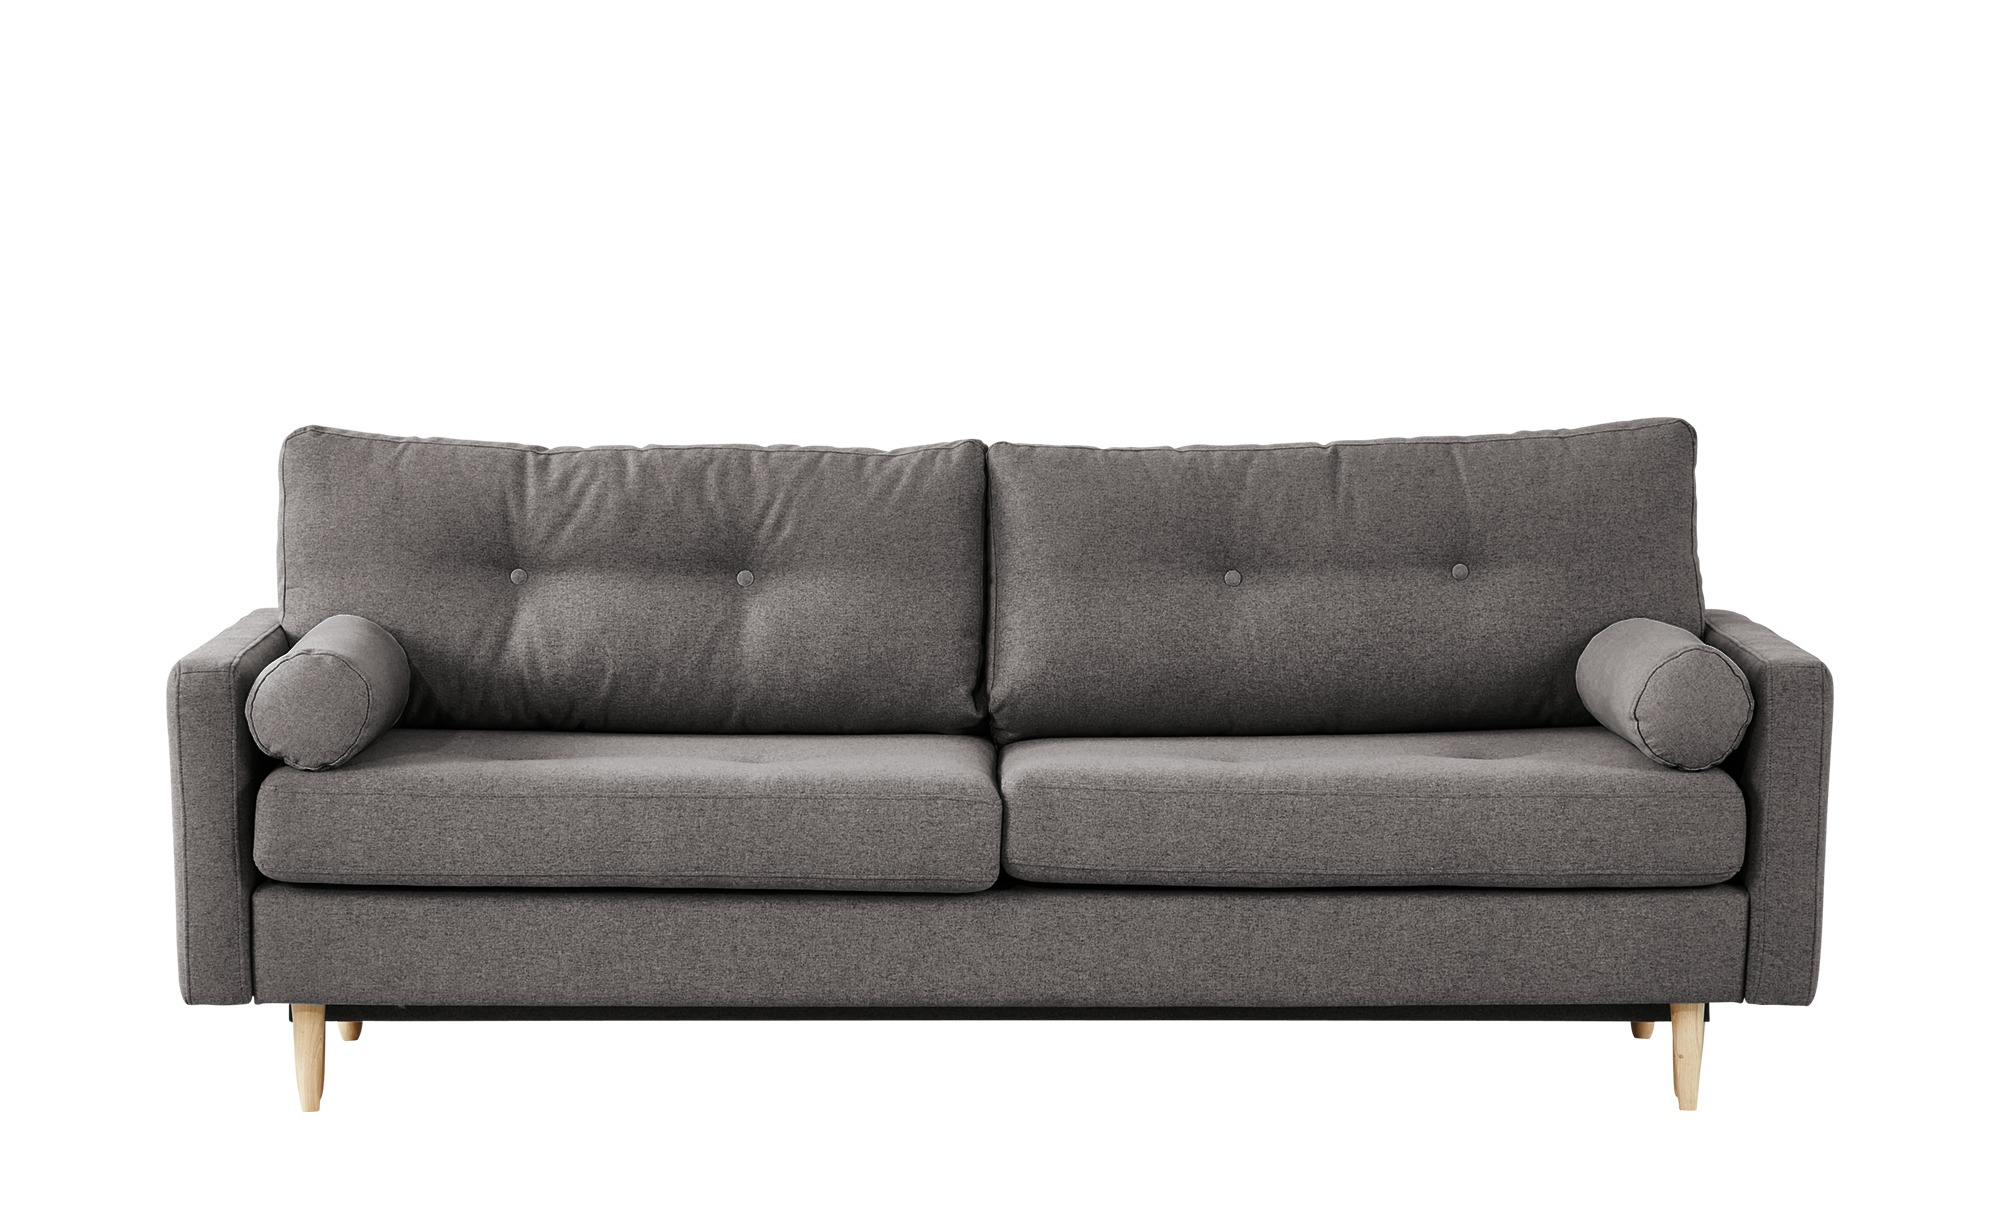 finya Design-Schlafsofa 3-sitzig grau - Webstoff Pure ¦ Maße (cm): B: 218 H: 85 T: 93 Polstermöbel > Sofas > 3-Sitzer - Höffner